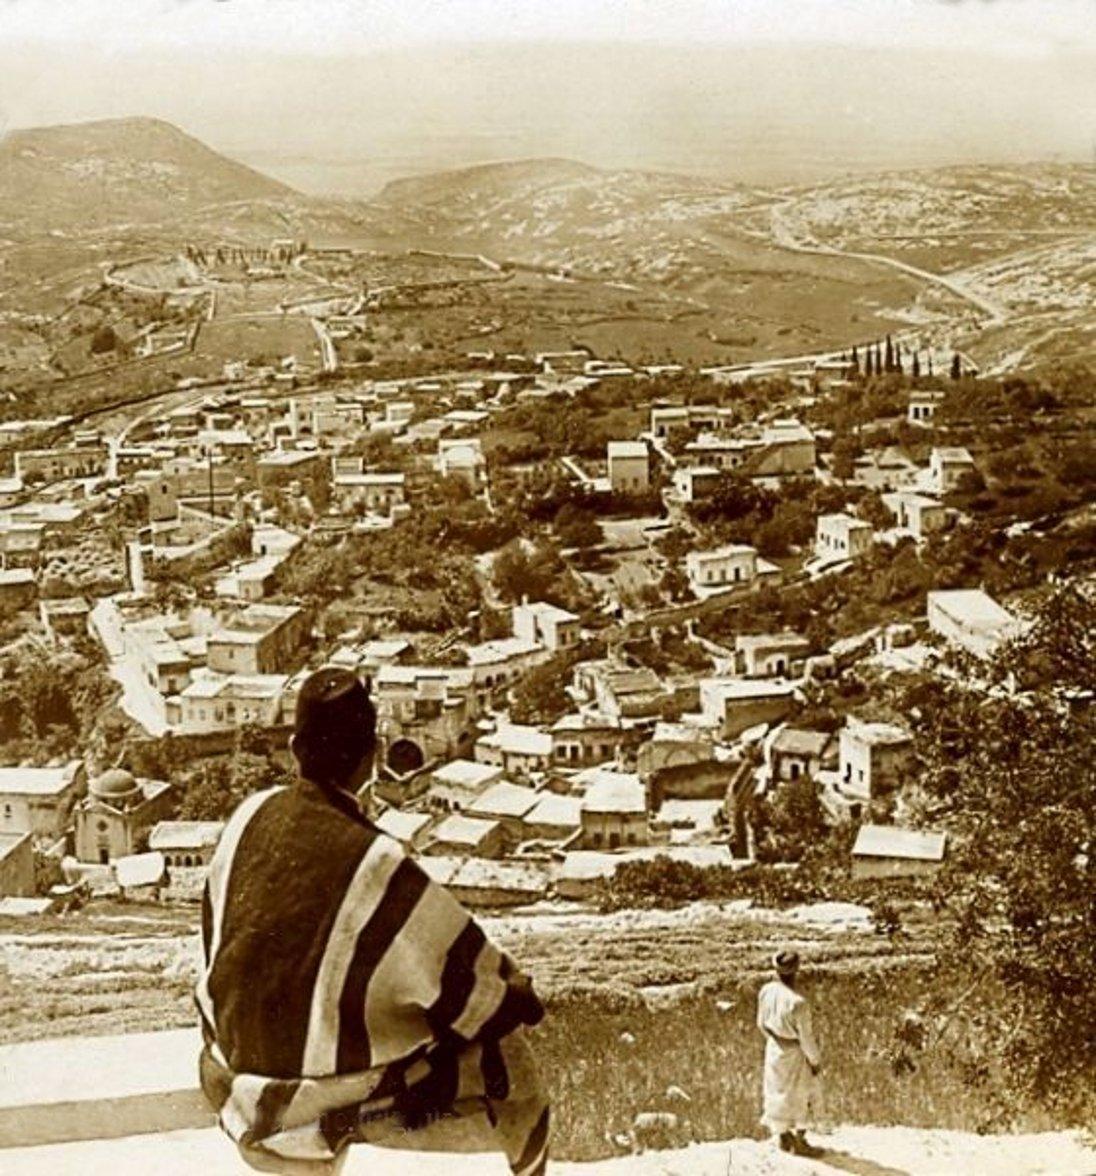 Nazareth-الناصرة: NAZARETH - Late 19th, early 20th c. 55 - circa 1905 - Bird's-eye view (Per Reem Ackall)